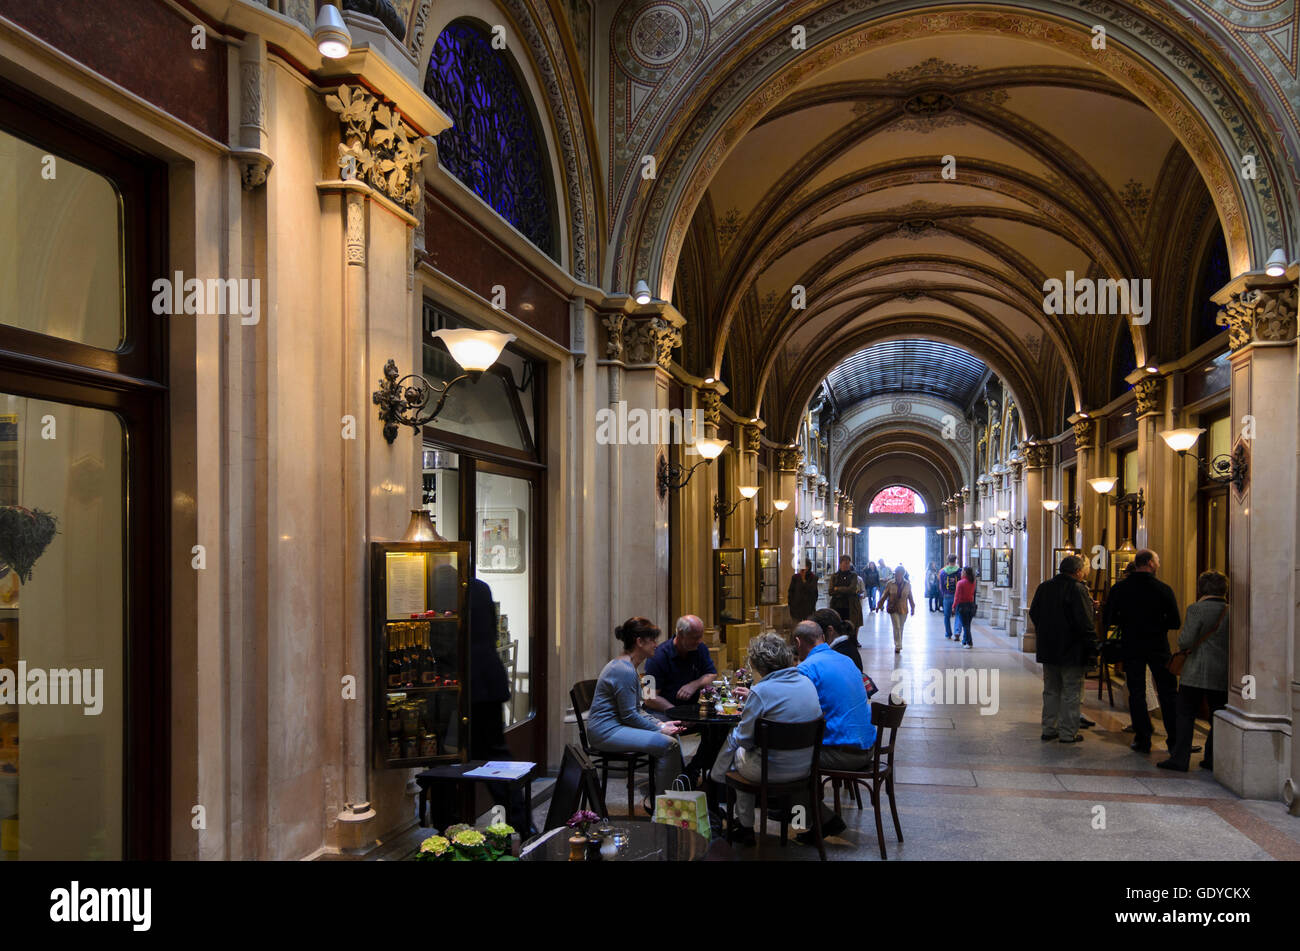 Wien, Vienna: Shopping arcade in the Palais Ferstel between Herrengasse and Freyung, Austria, Wien, 01. - Stock Image